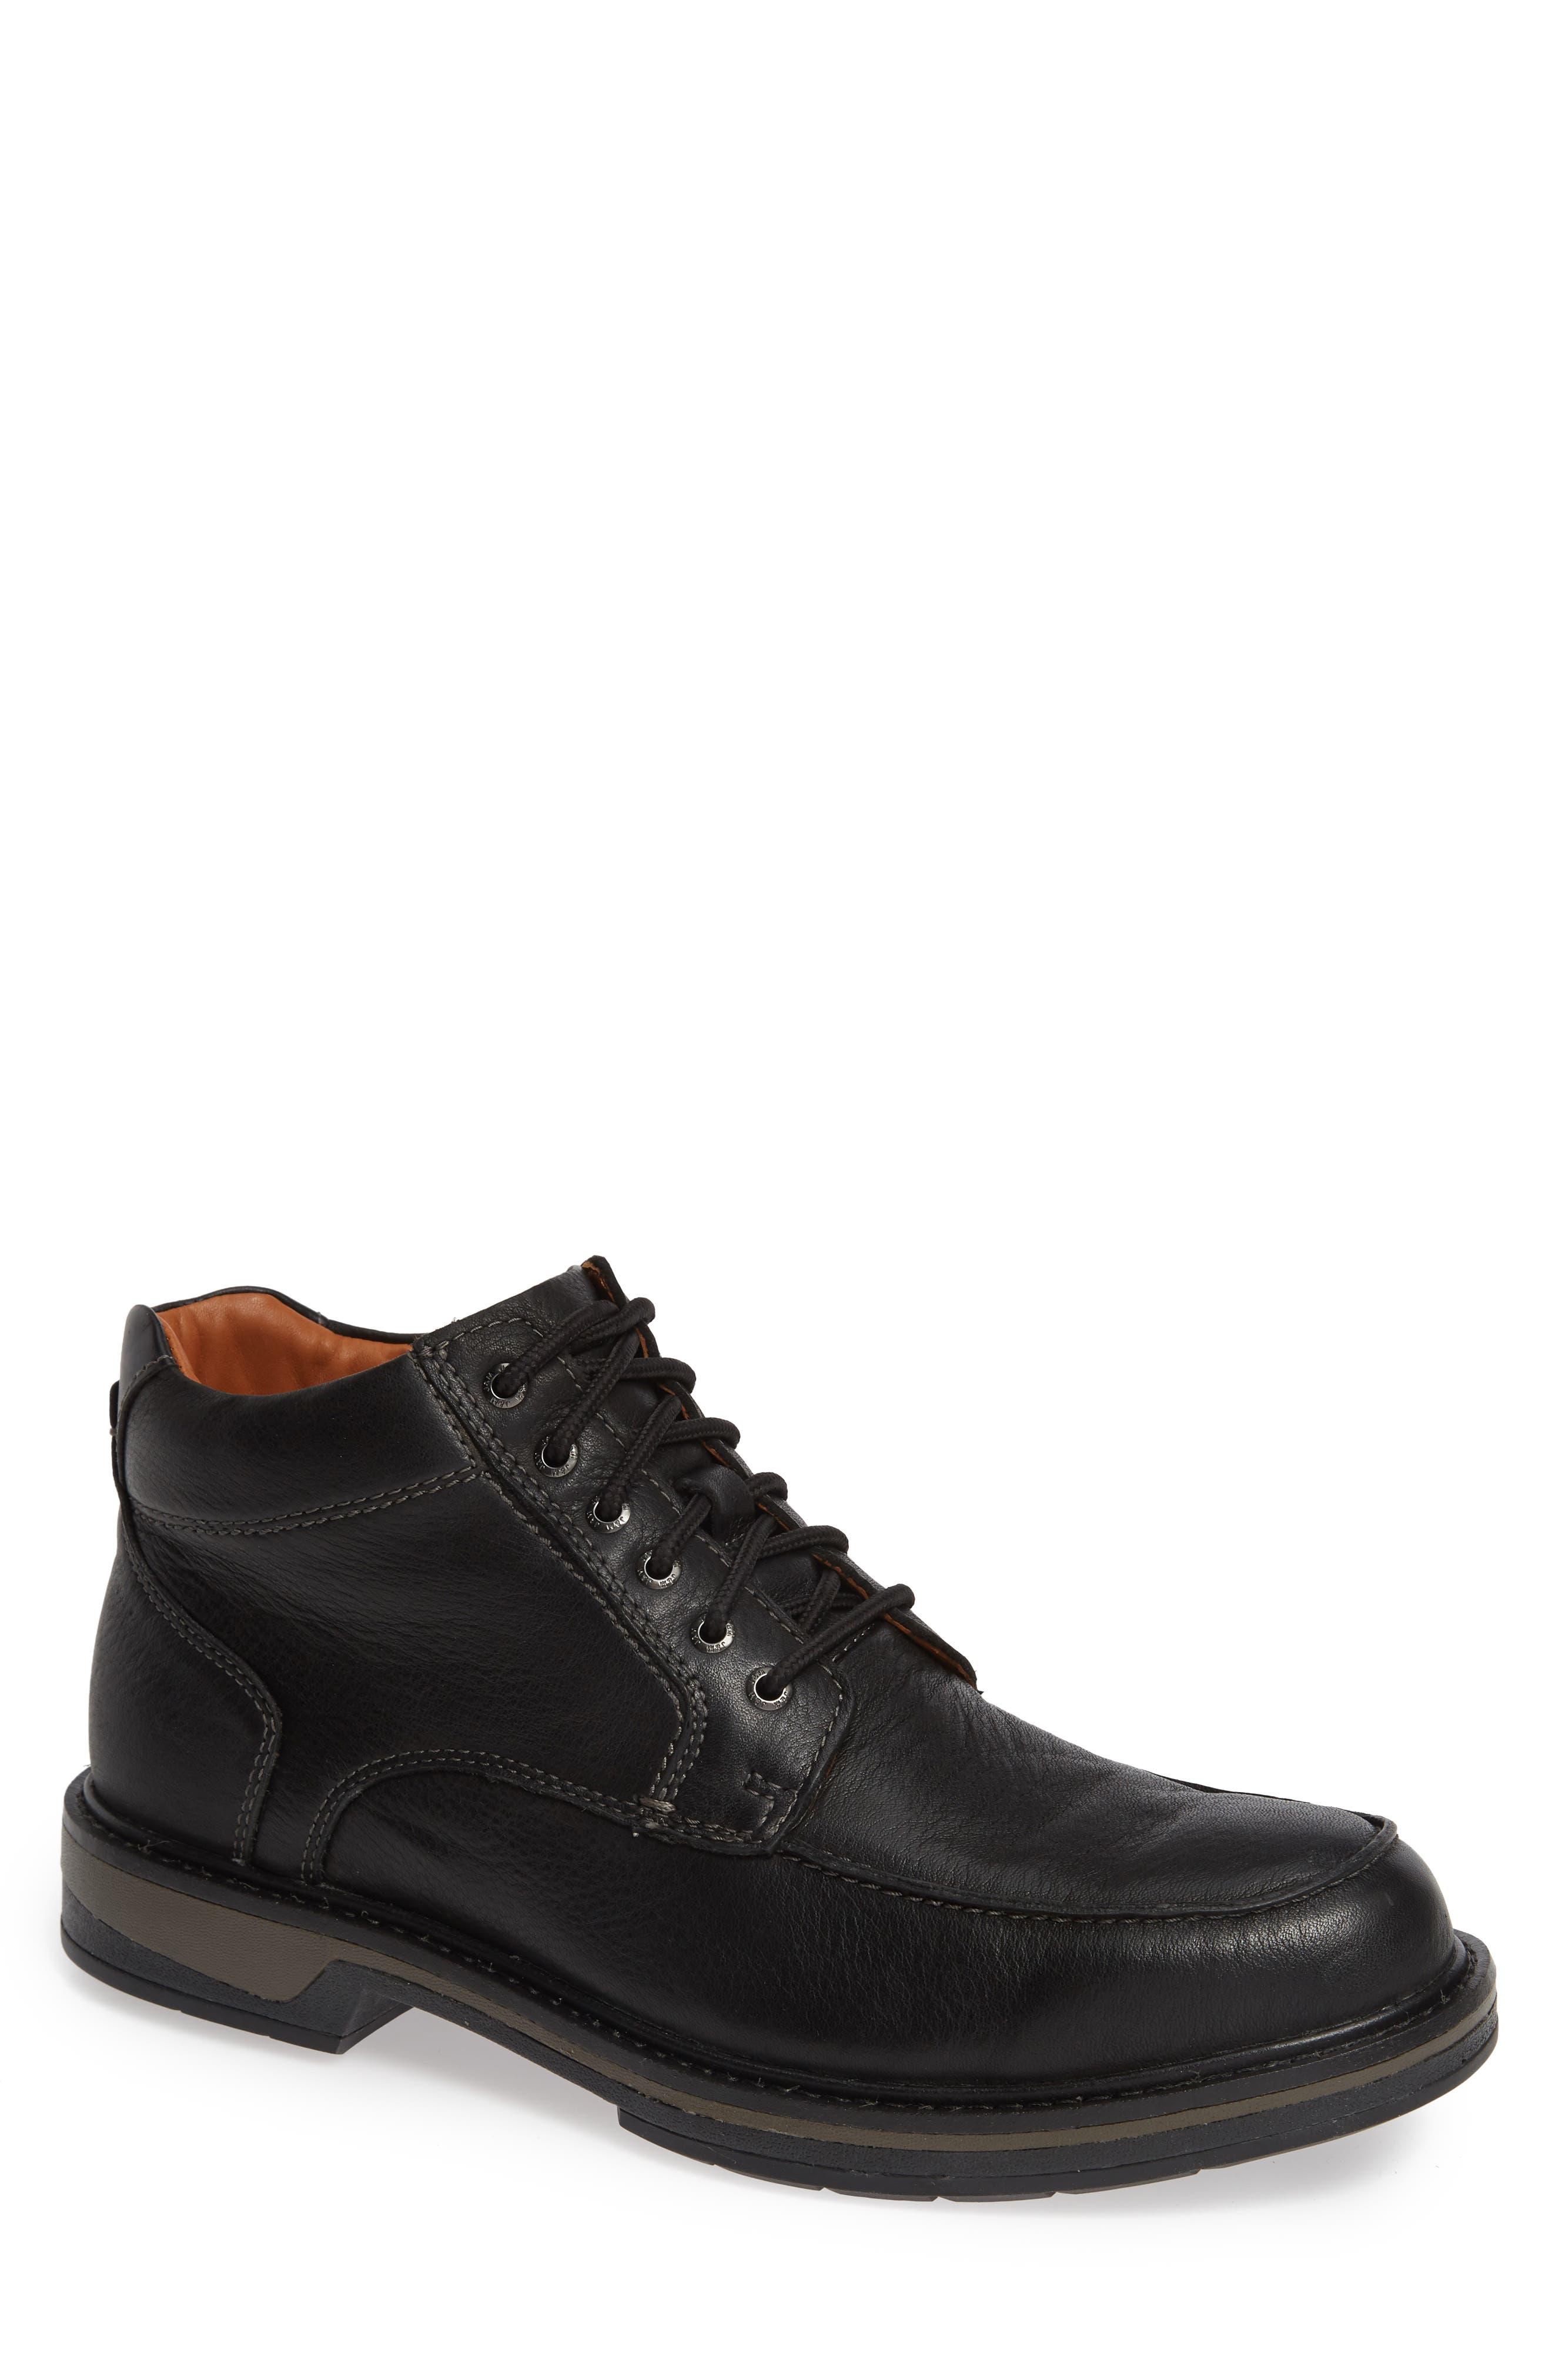 Rutledge Waterproof Moc Toe Boot,                         Main,                         color, BLACK LEATHER